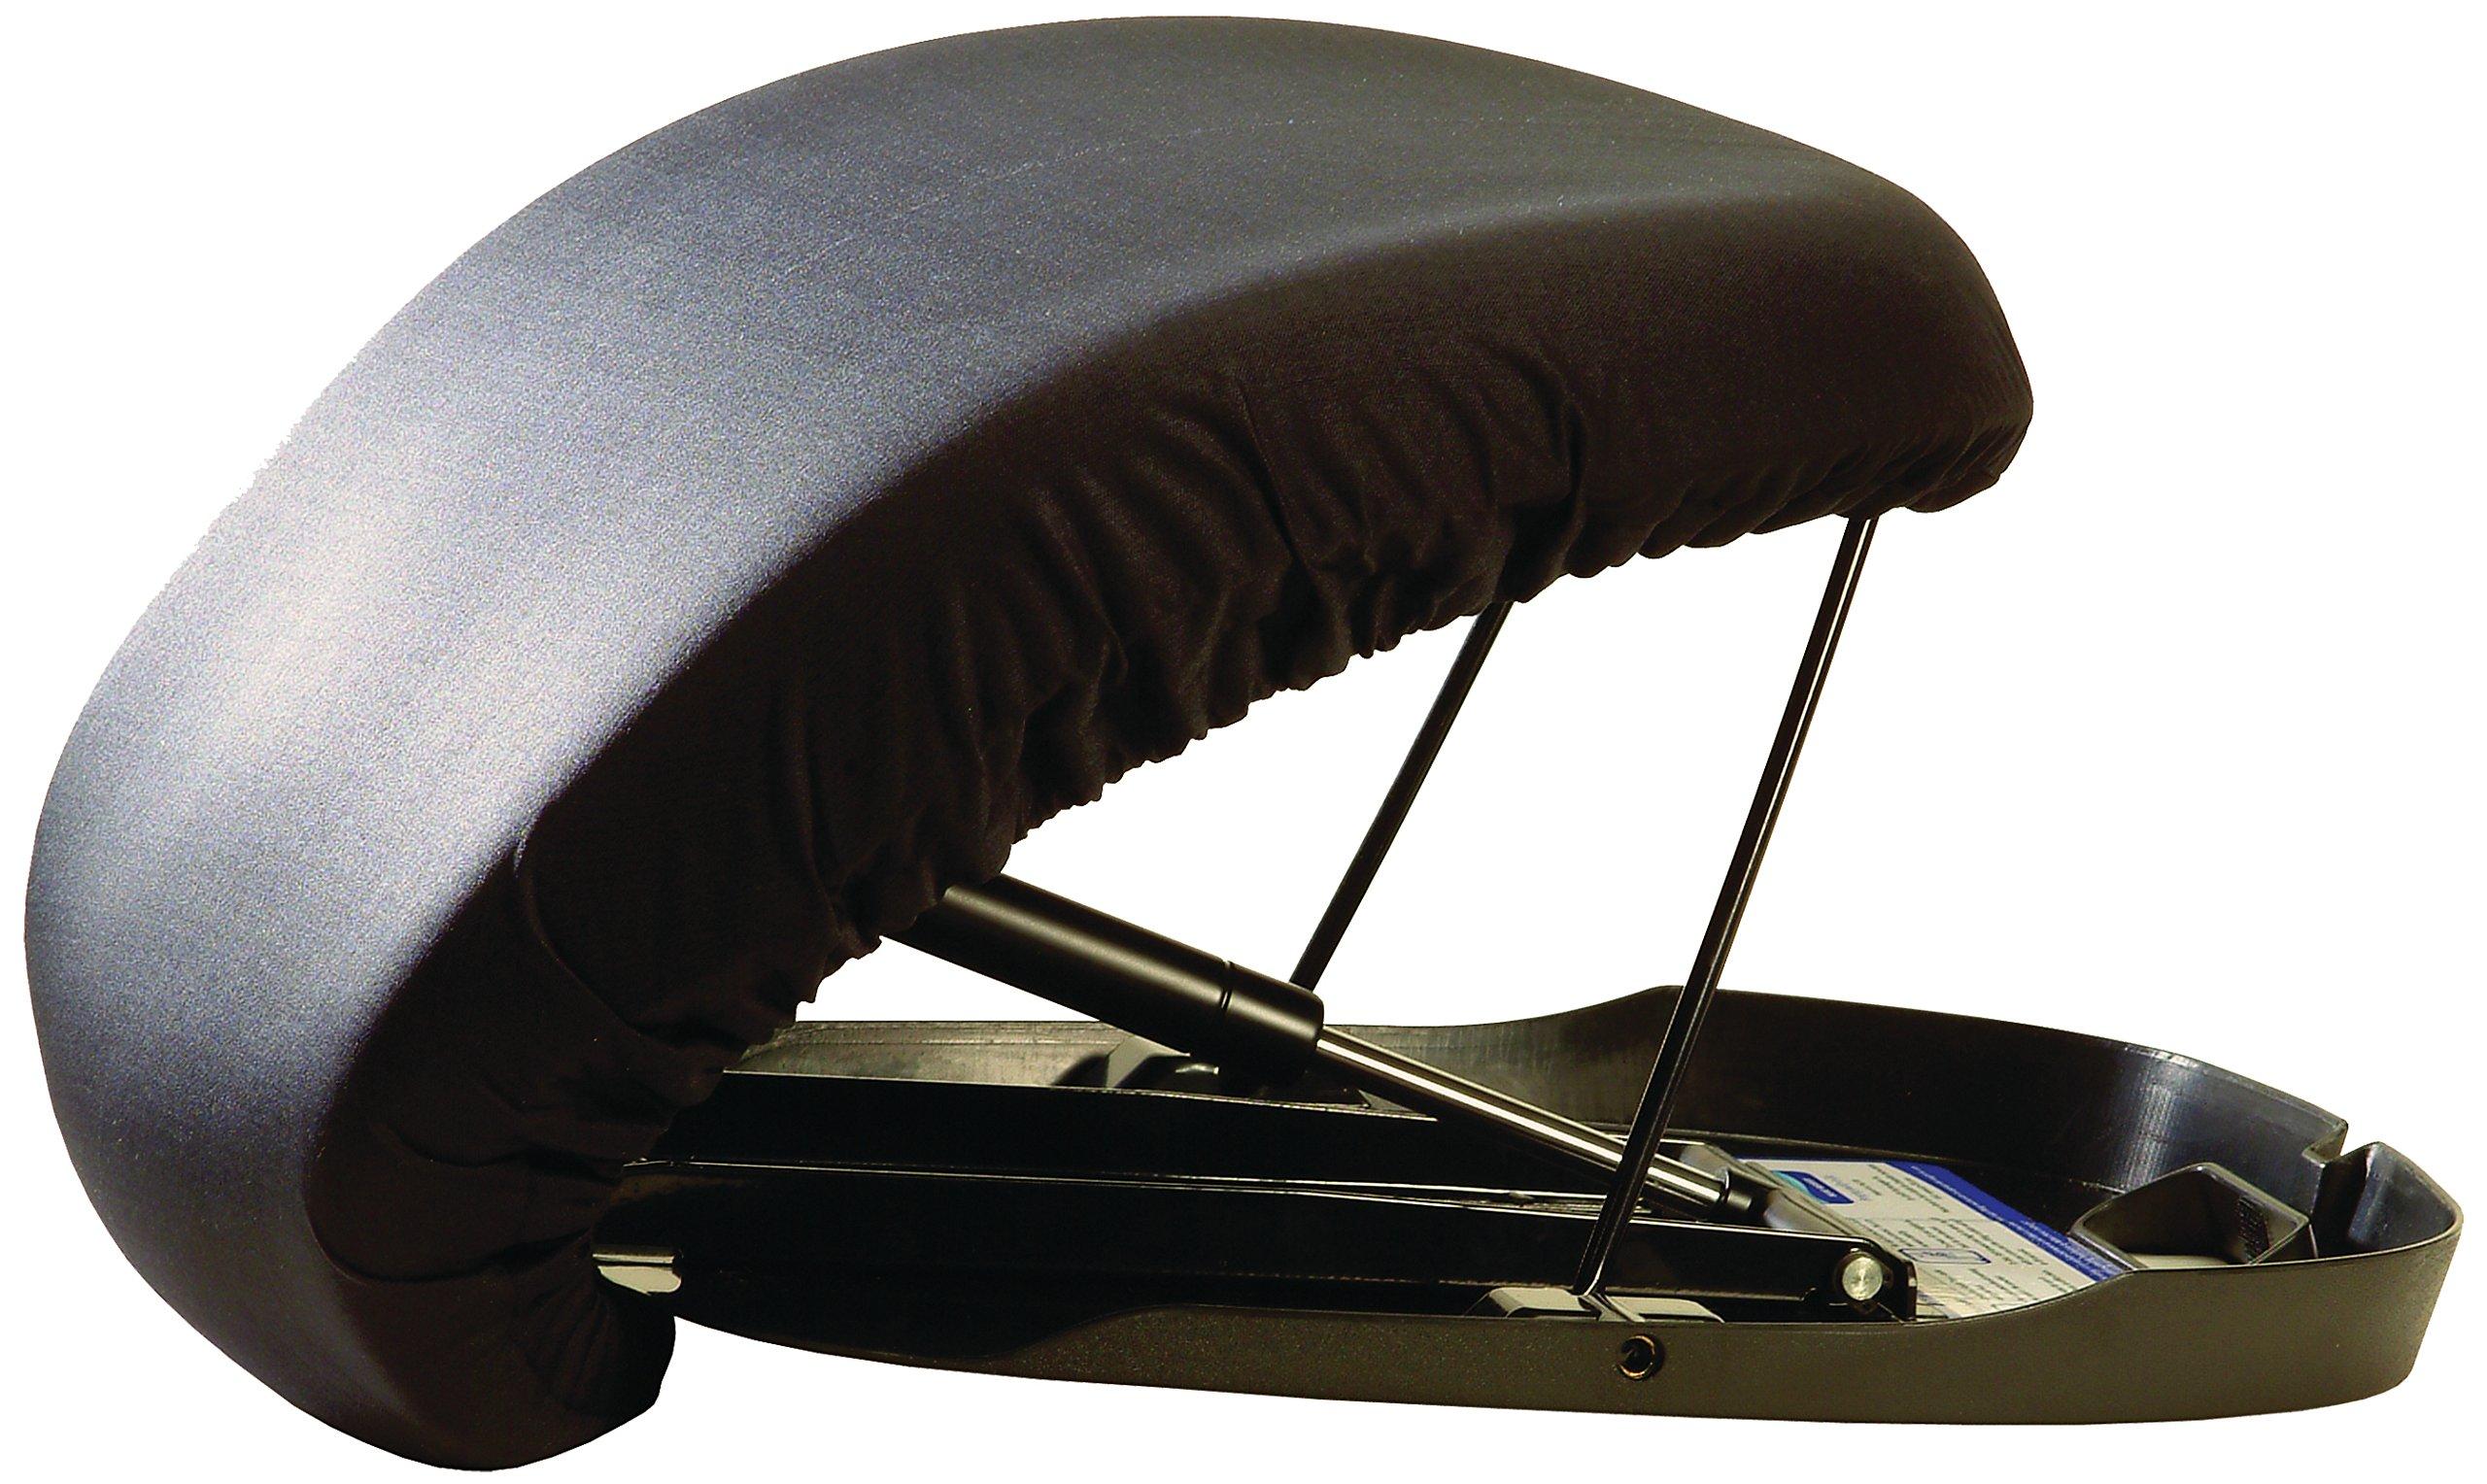 Carex Health Brands Uplift Premium Seat Assist